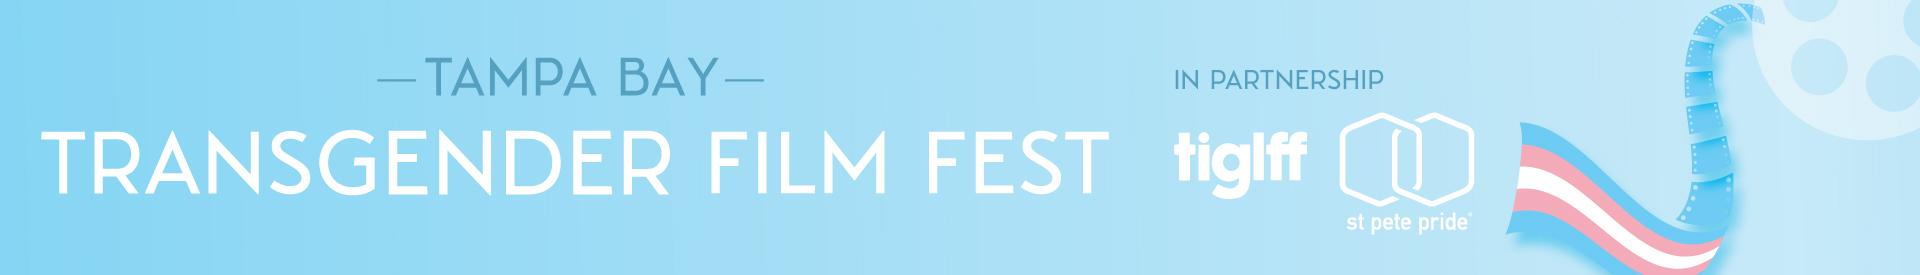 Tampa Bay Transgender Film Festival